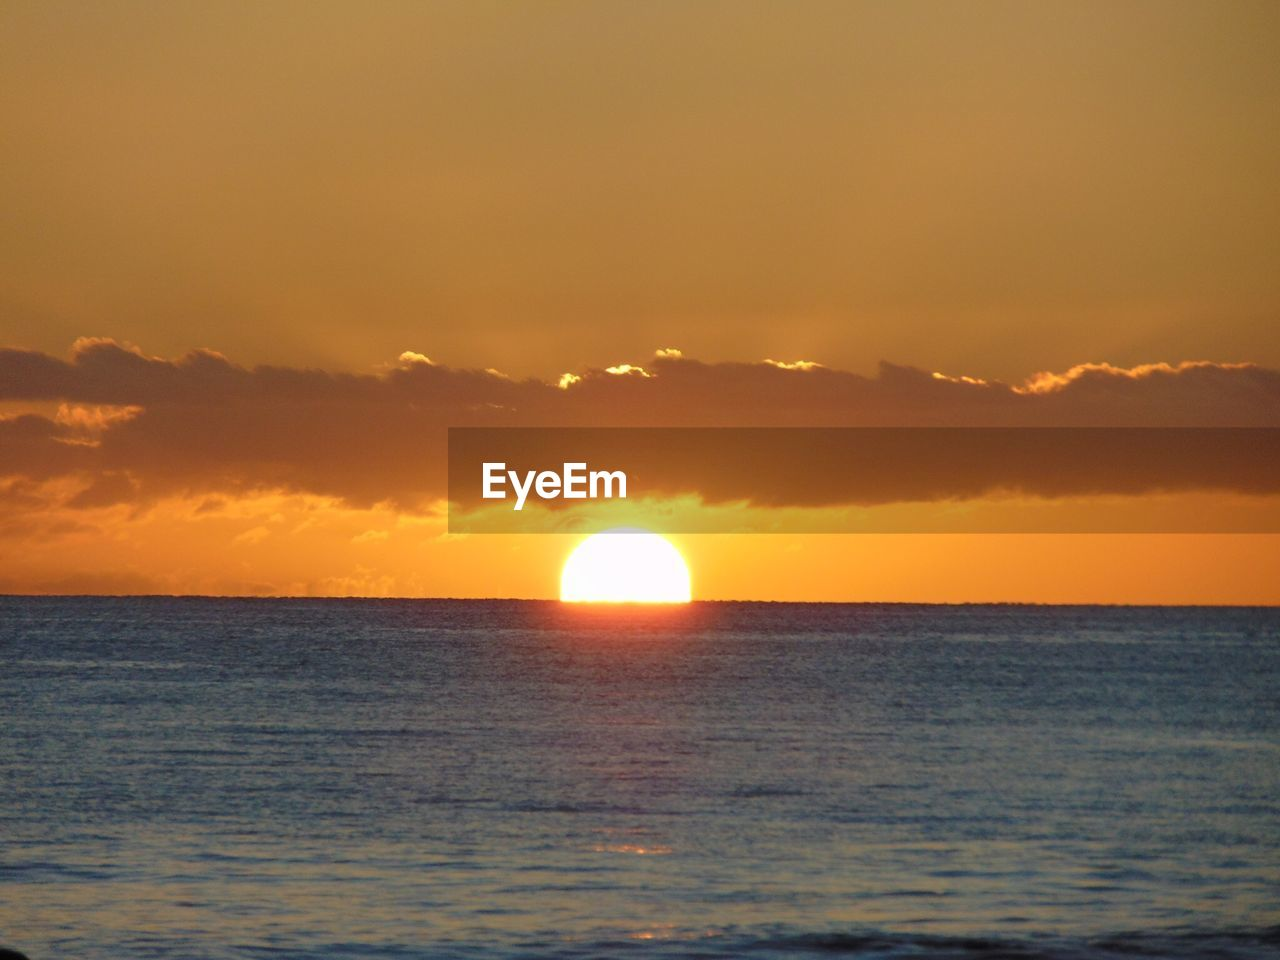 sunset, sea, sun, scenics, beauty in nature, nature, horizon over water, sky, tranquility, tranquil scene, water, idyllic, horizon, silhouette, no people, yellow, outdoors, scenery